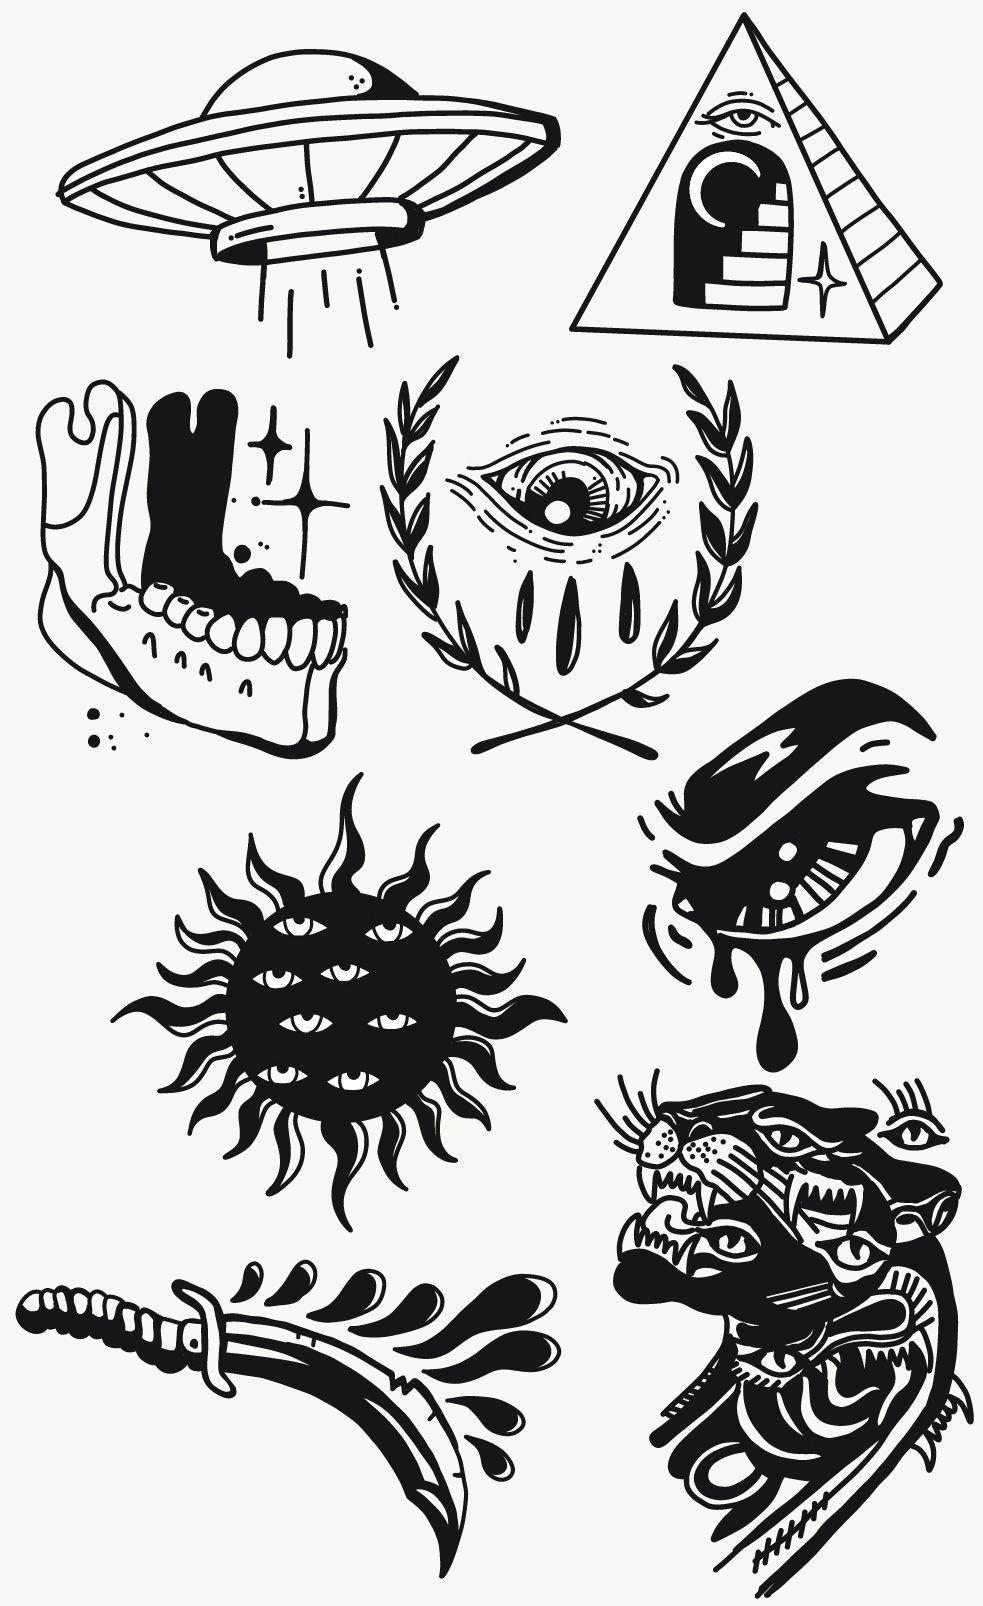 Hunter macleod flash sheet in 2020 tattoo flash sheet